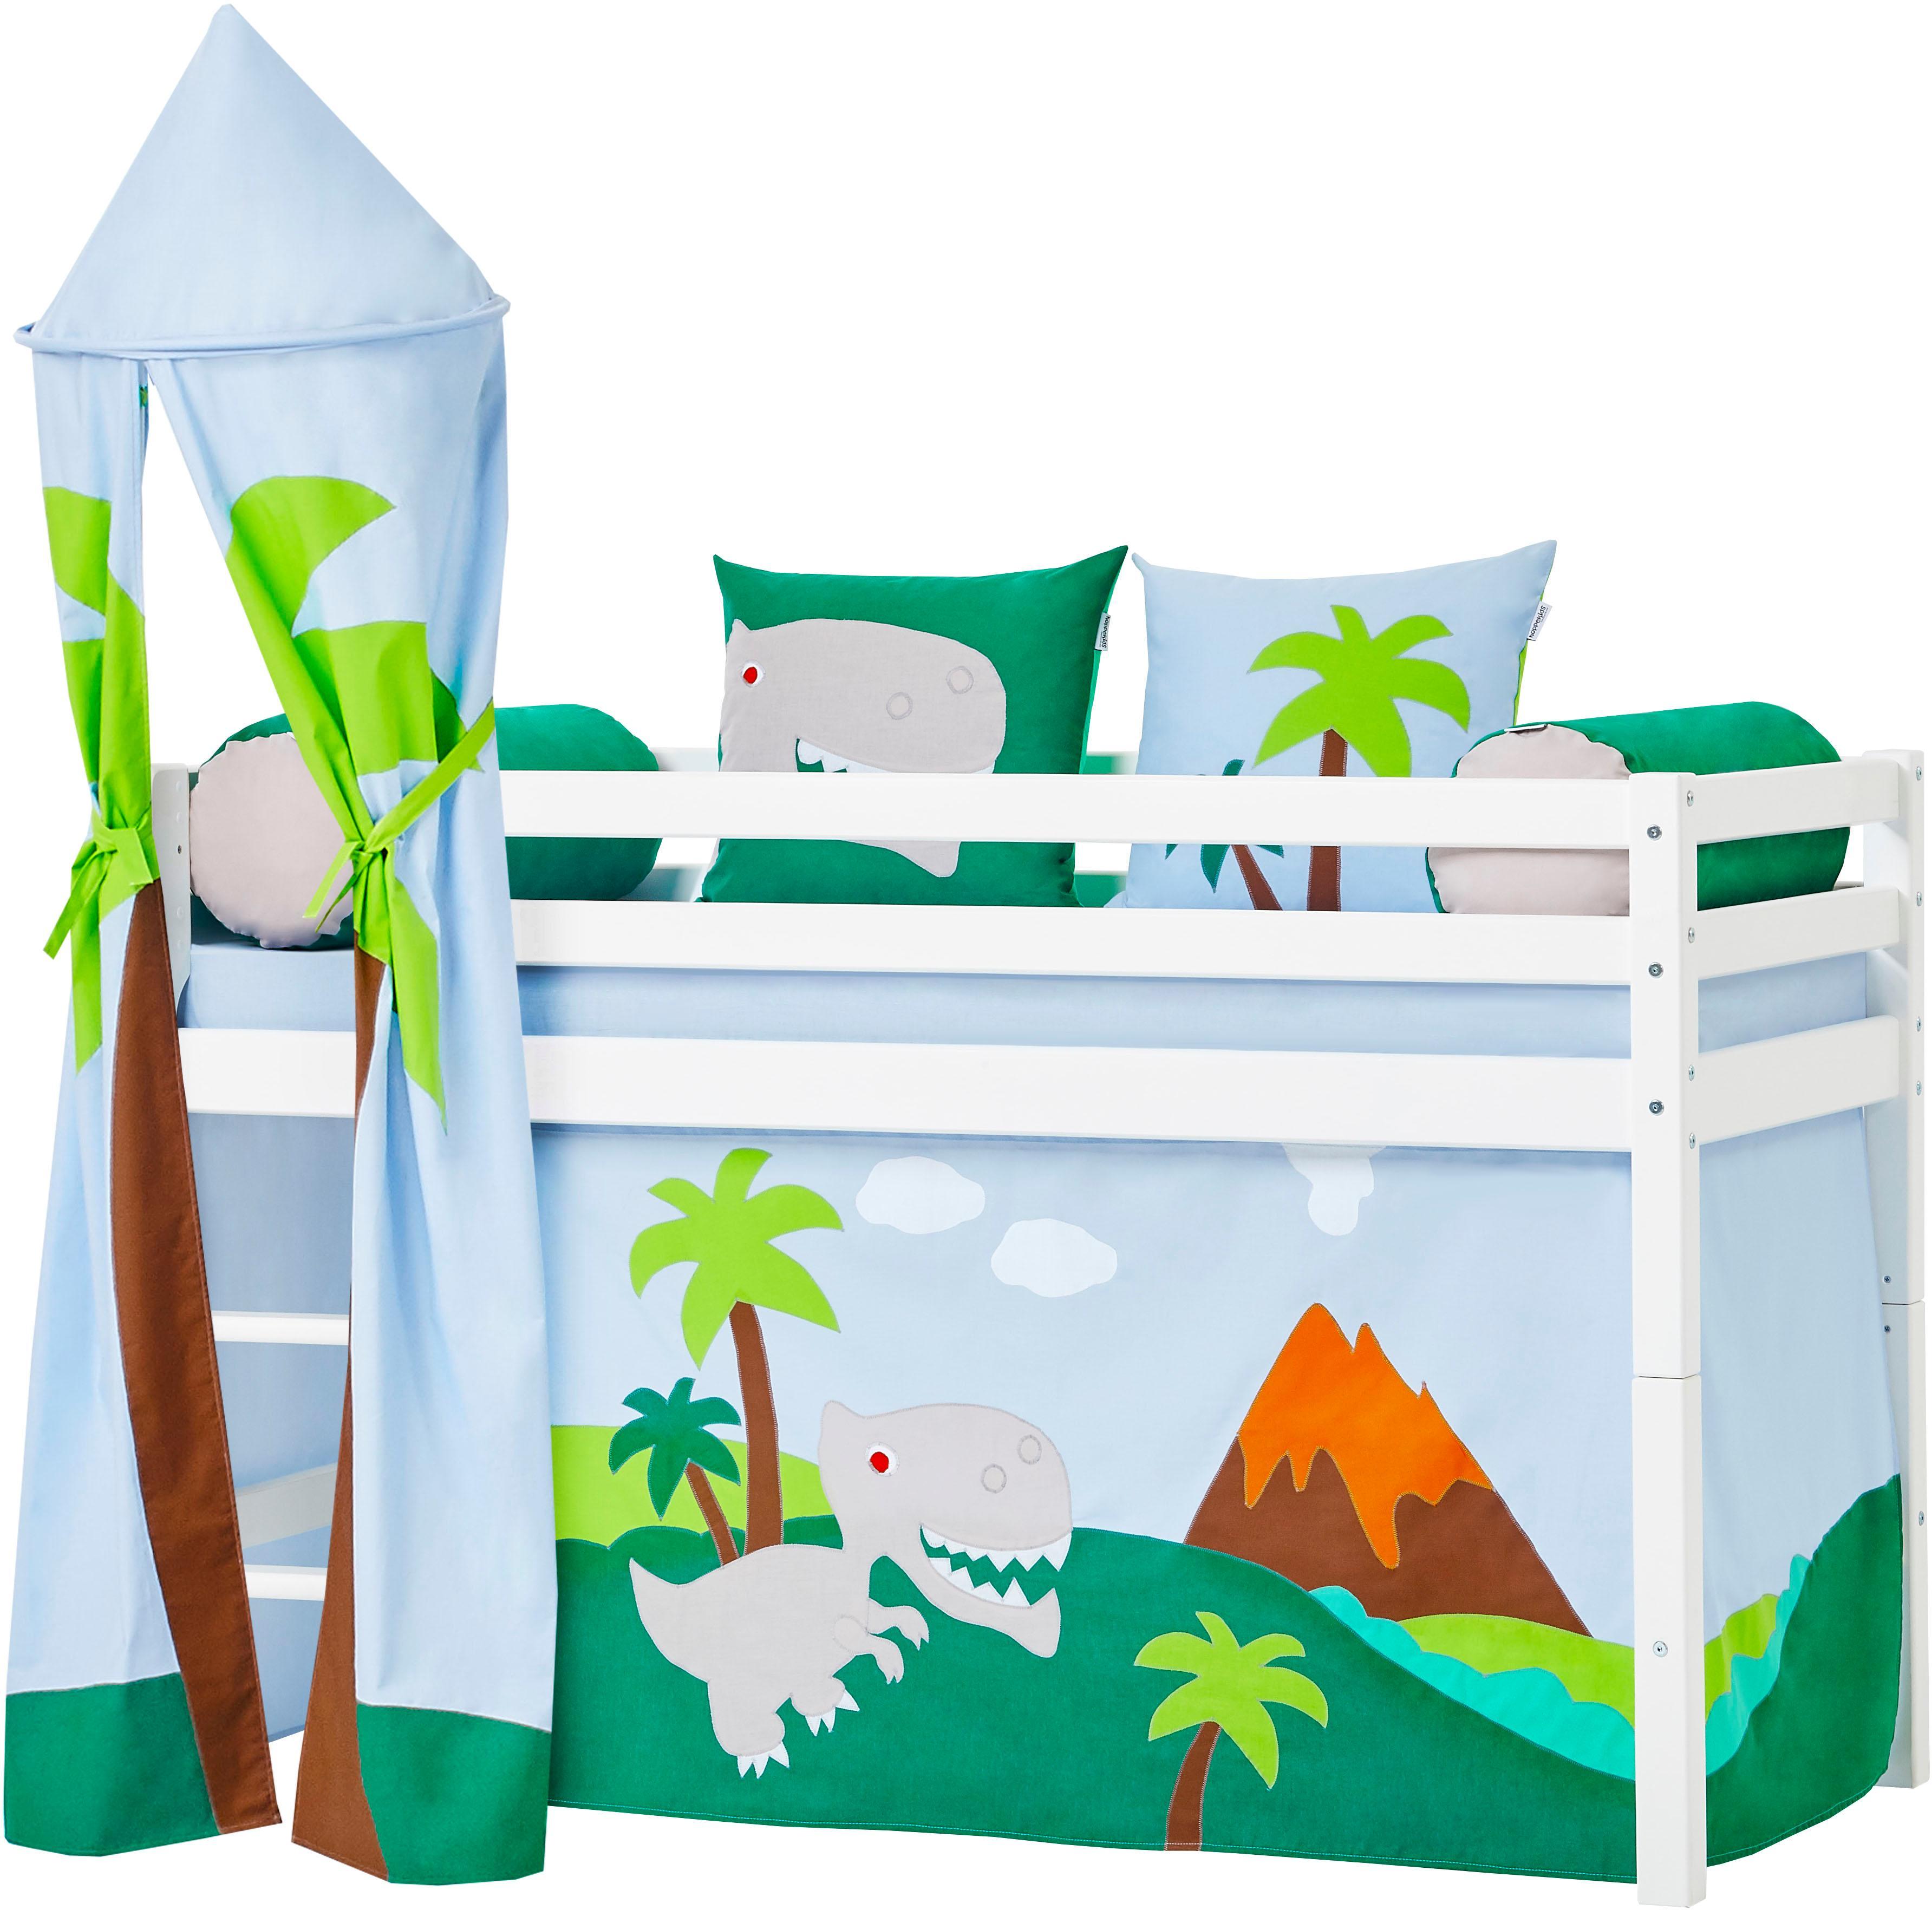 Hoppekids Kissenrollen-Set (2tlg.) »Dinosaurier«   Büro > Bürostühle und Sessel  > Bürostühle-Zubehör   Grün   HOPPEKIDS